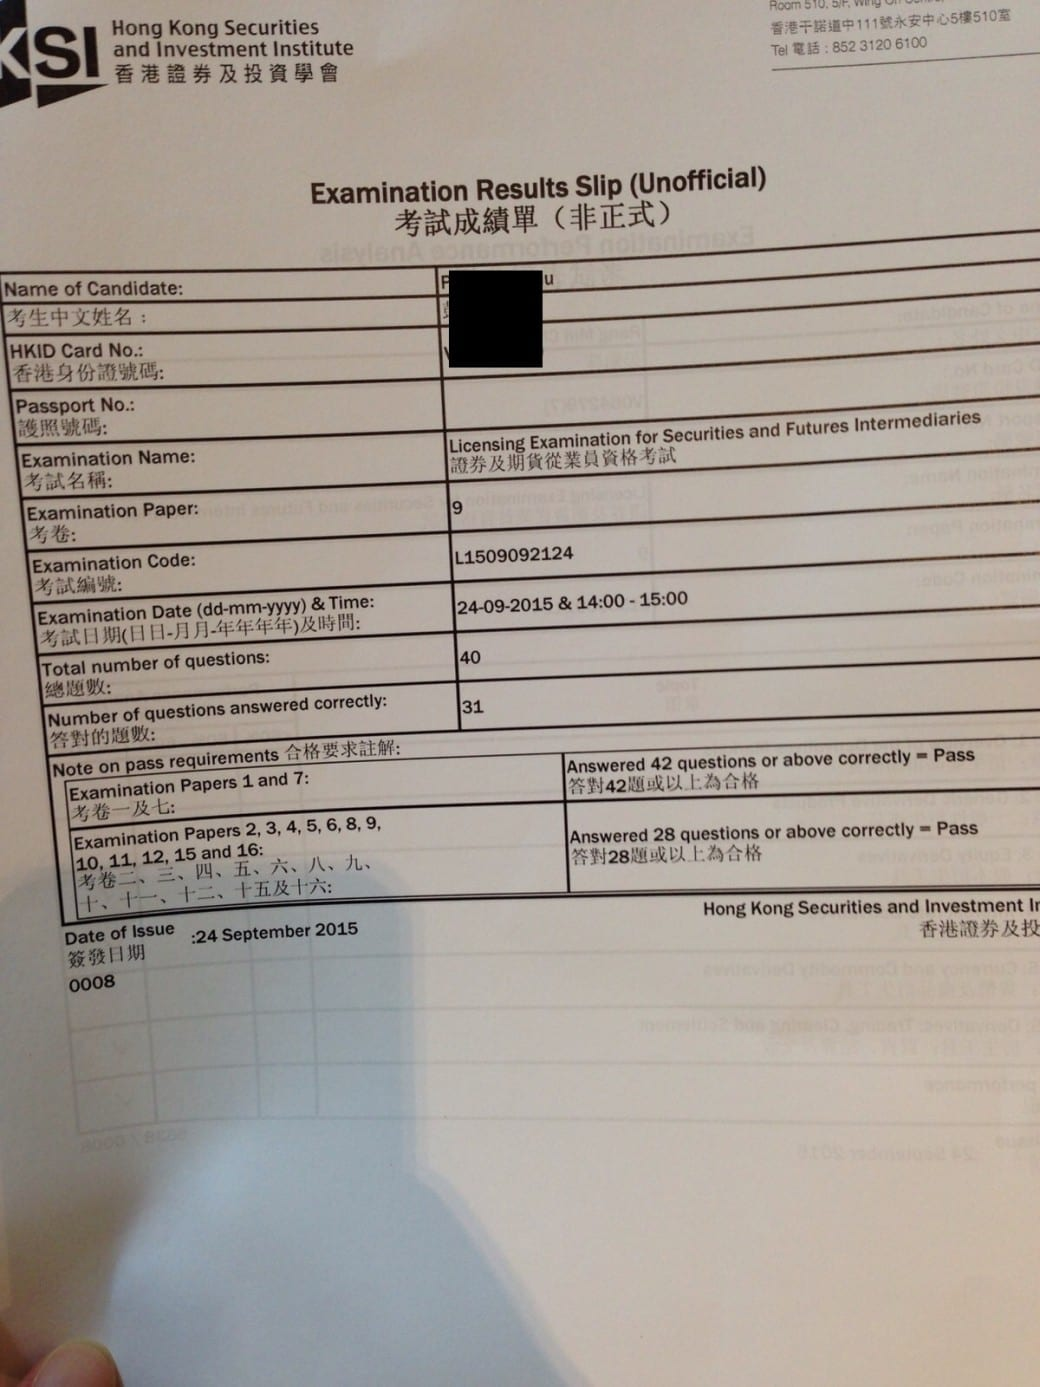 Mcpang 24/9/2015 HKSI Paper 9 Pass